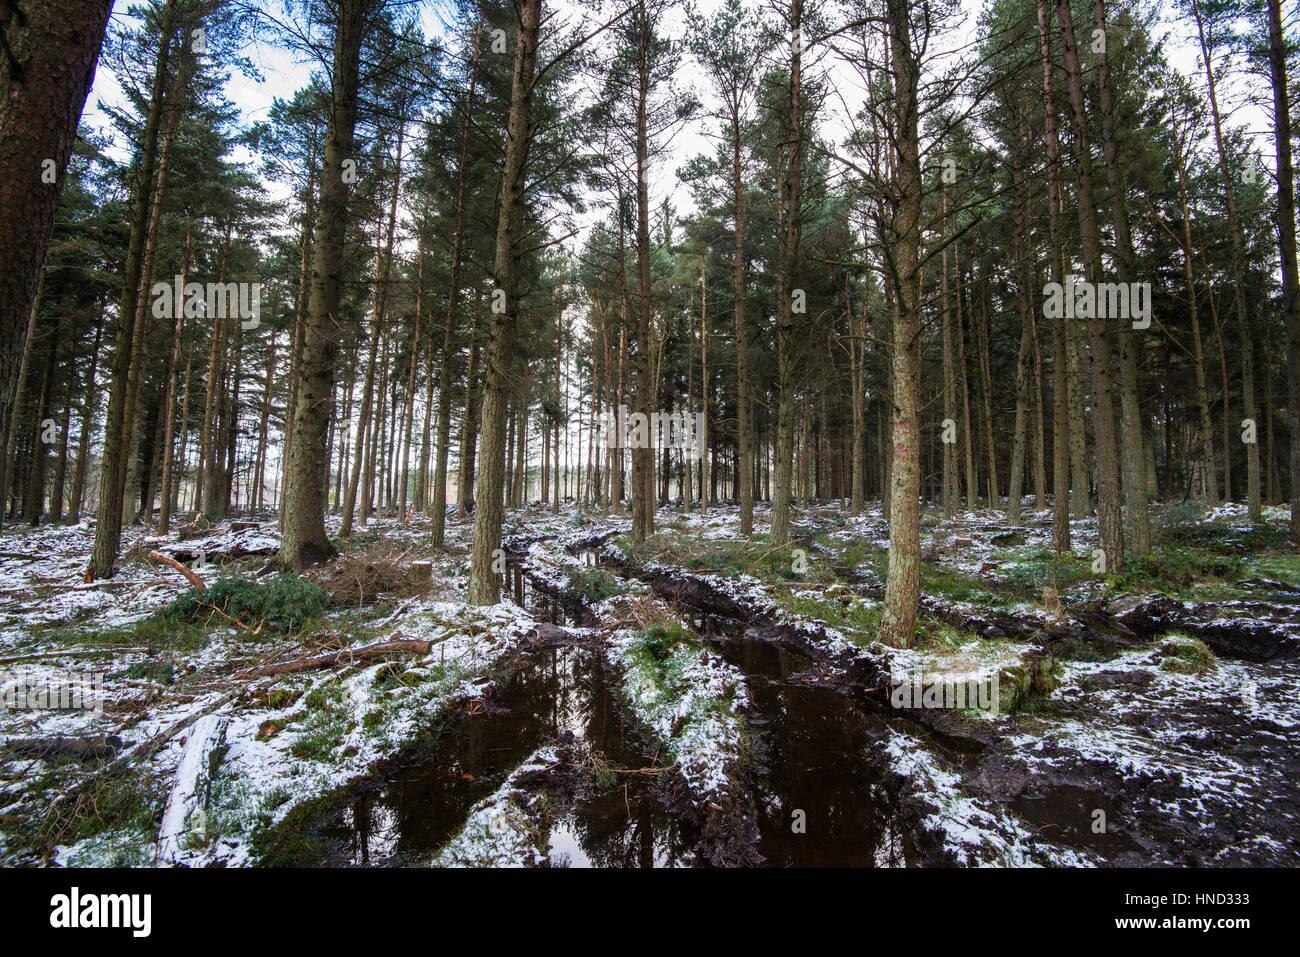 Anderson Wood, Hazlehead Park - Stock Image